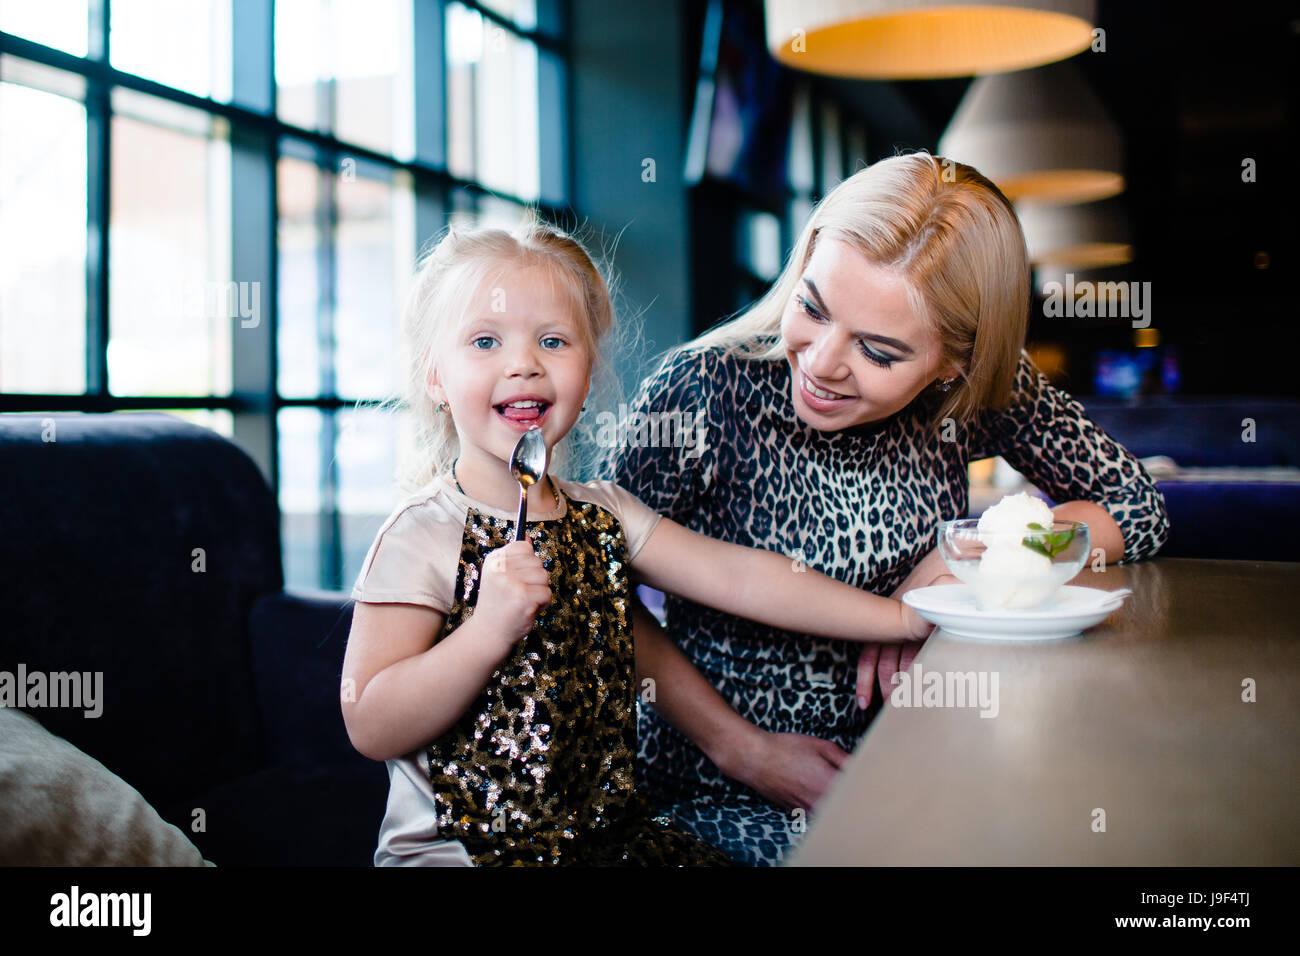 Madre e hija en cafe Imagen De Stock